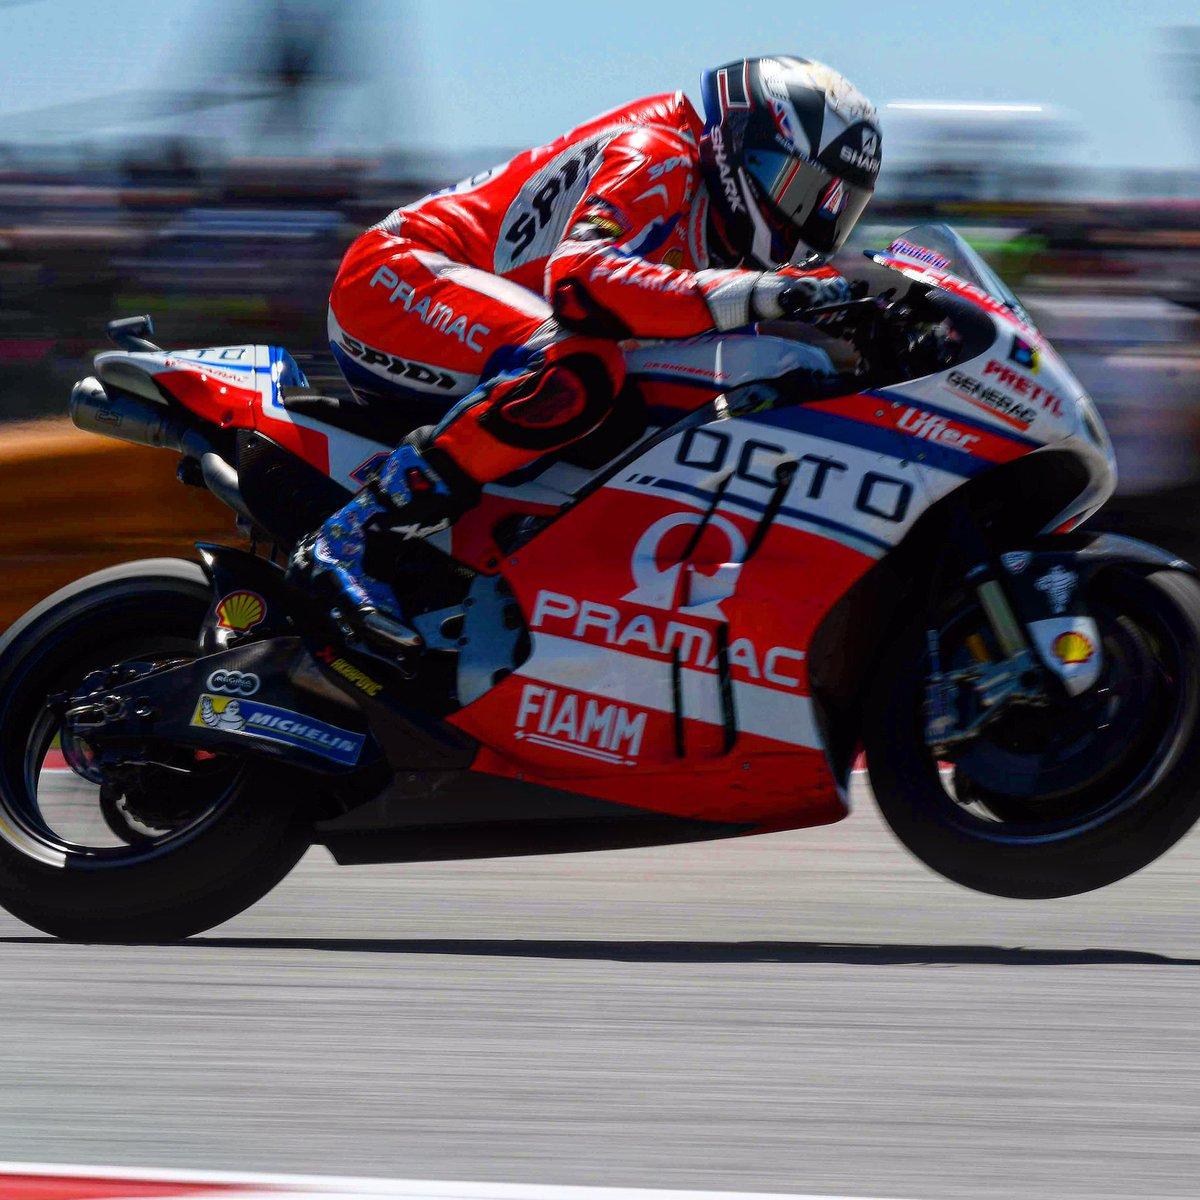 Go! @Reddingpower #AmericasGP @MotoGP @pramacracing #speed #bikes #bikers #race #ridetrue @spidiwarrior